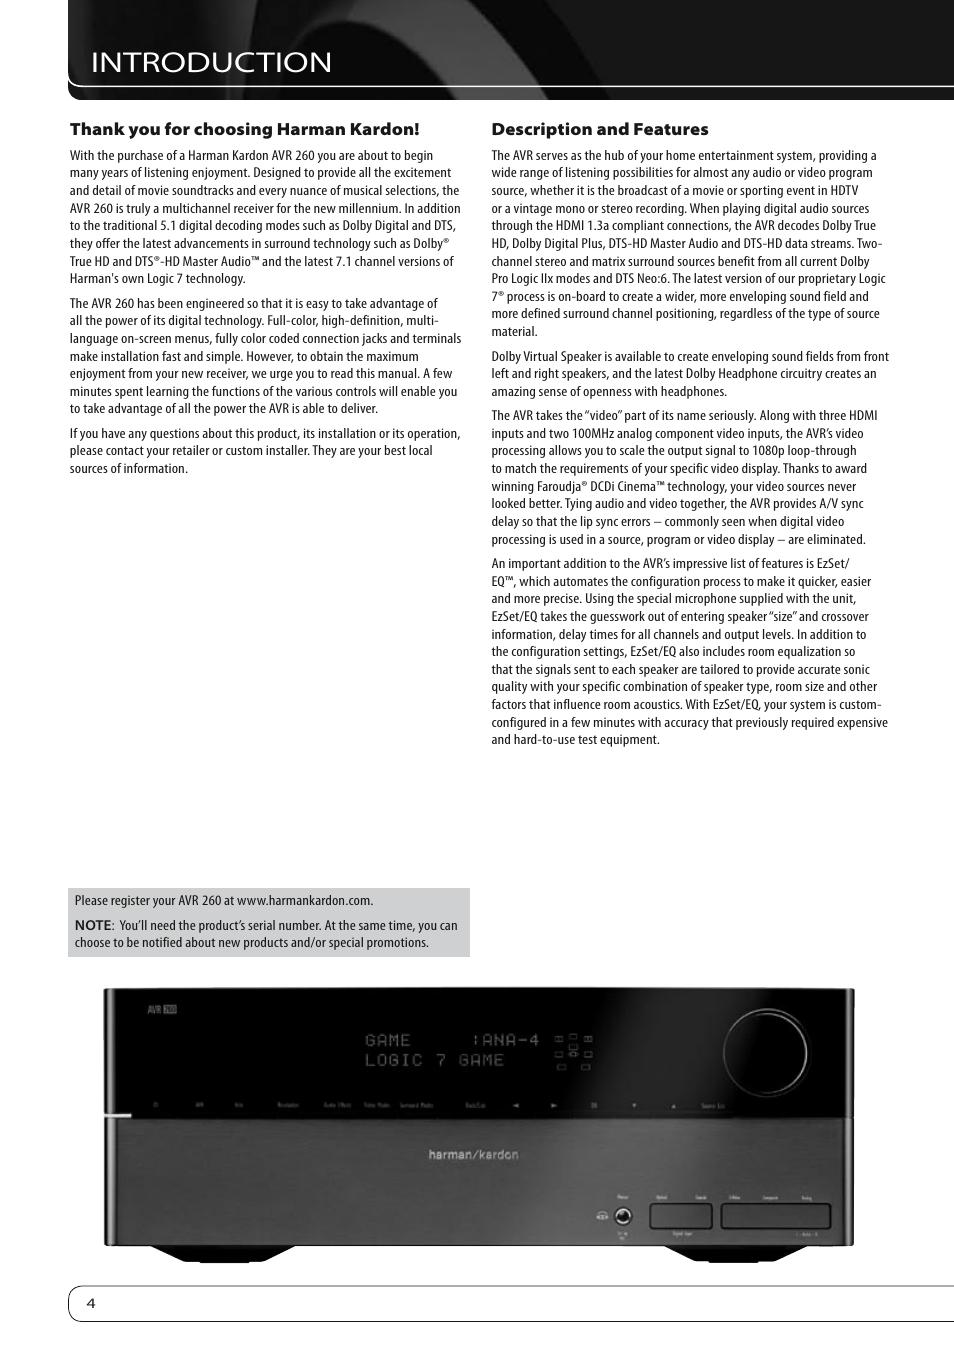 introduction harman kardon avr 260 user manual page 4 54 rh manualsdir com Harman Kardon AVR 525 Harman Kardon AVR 1650